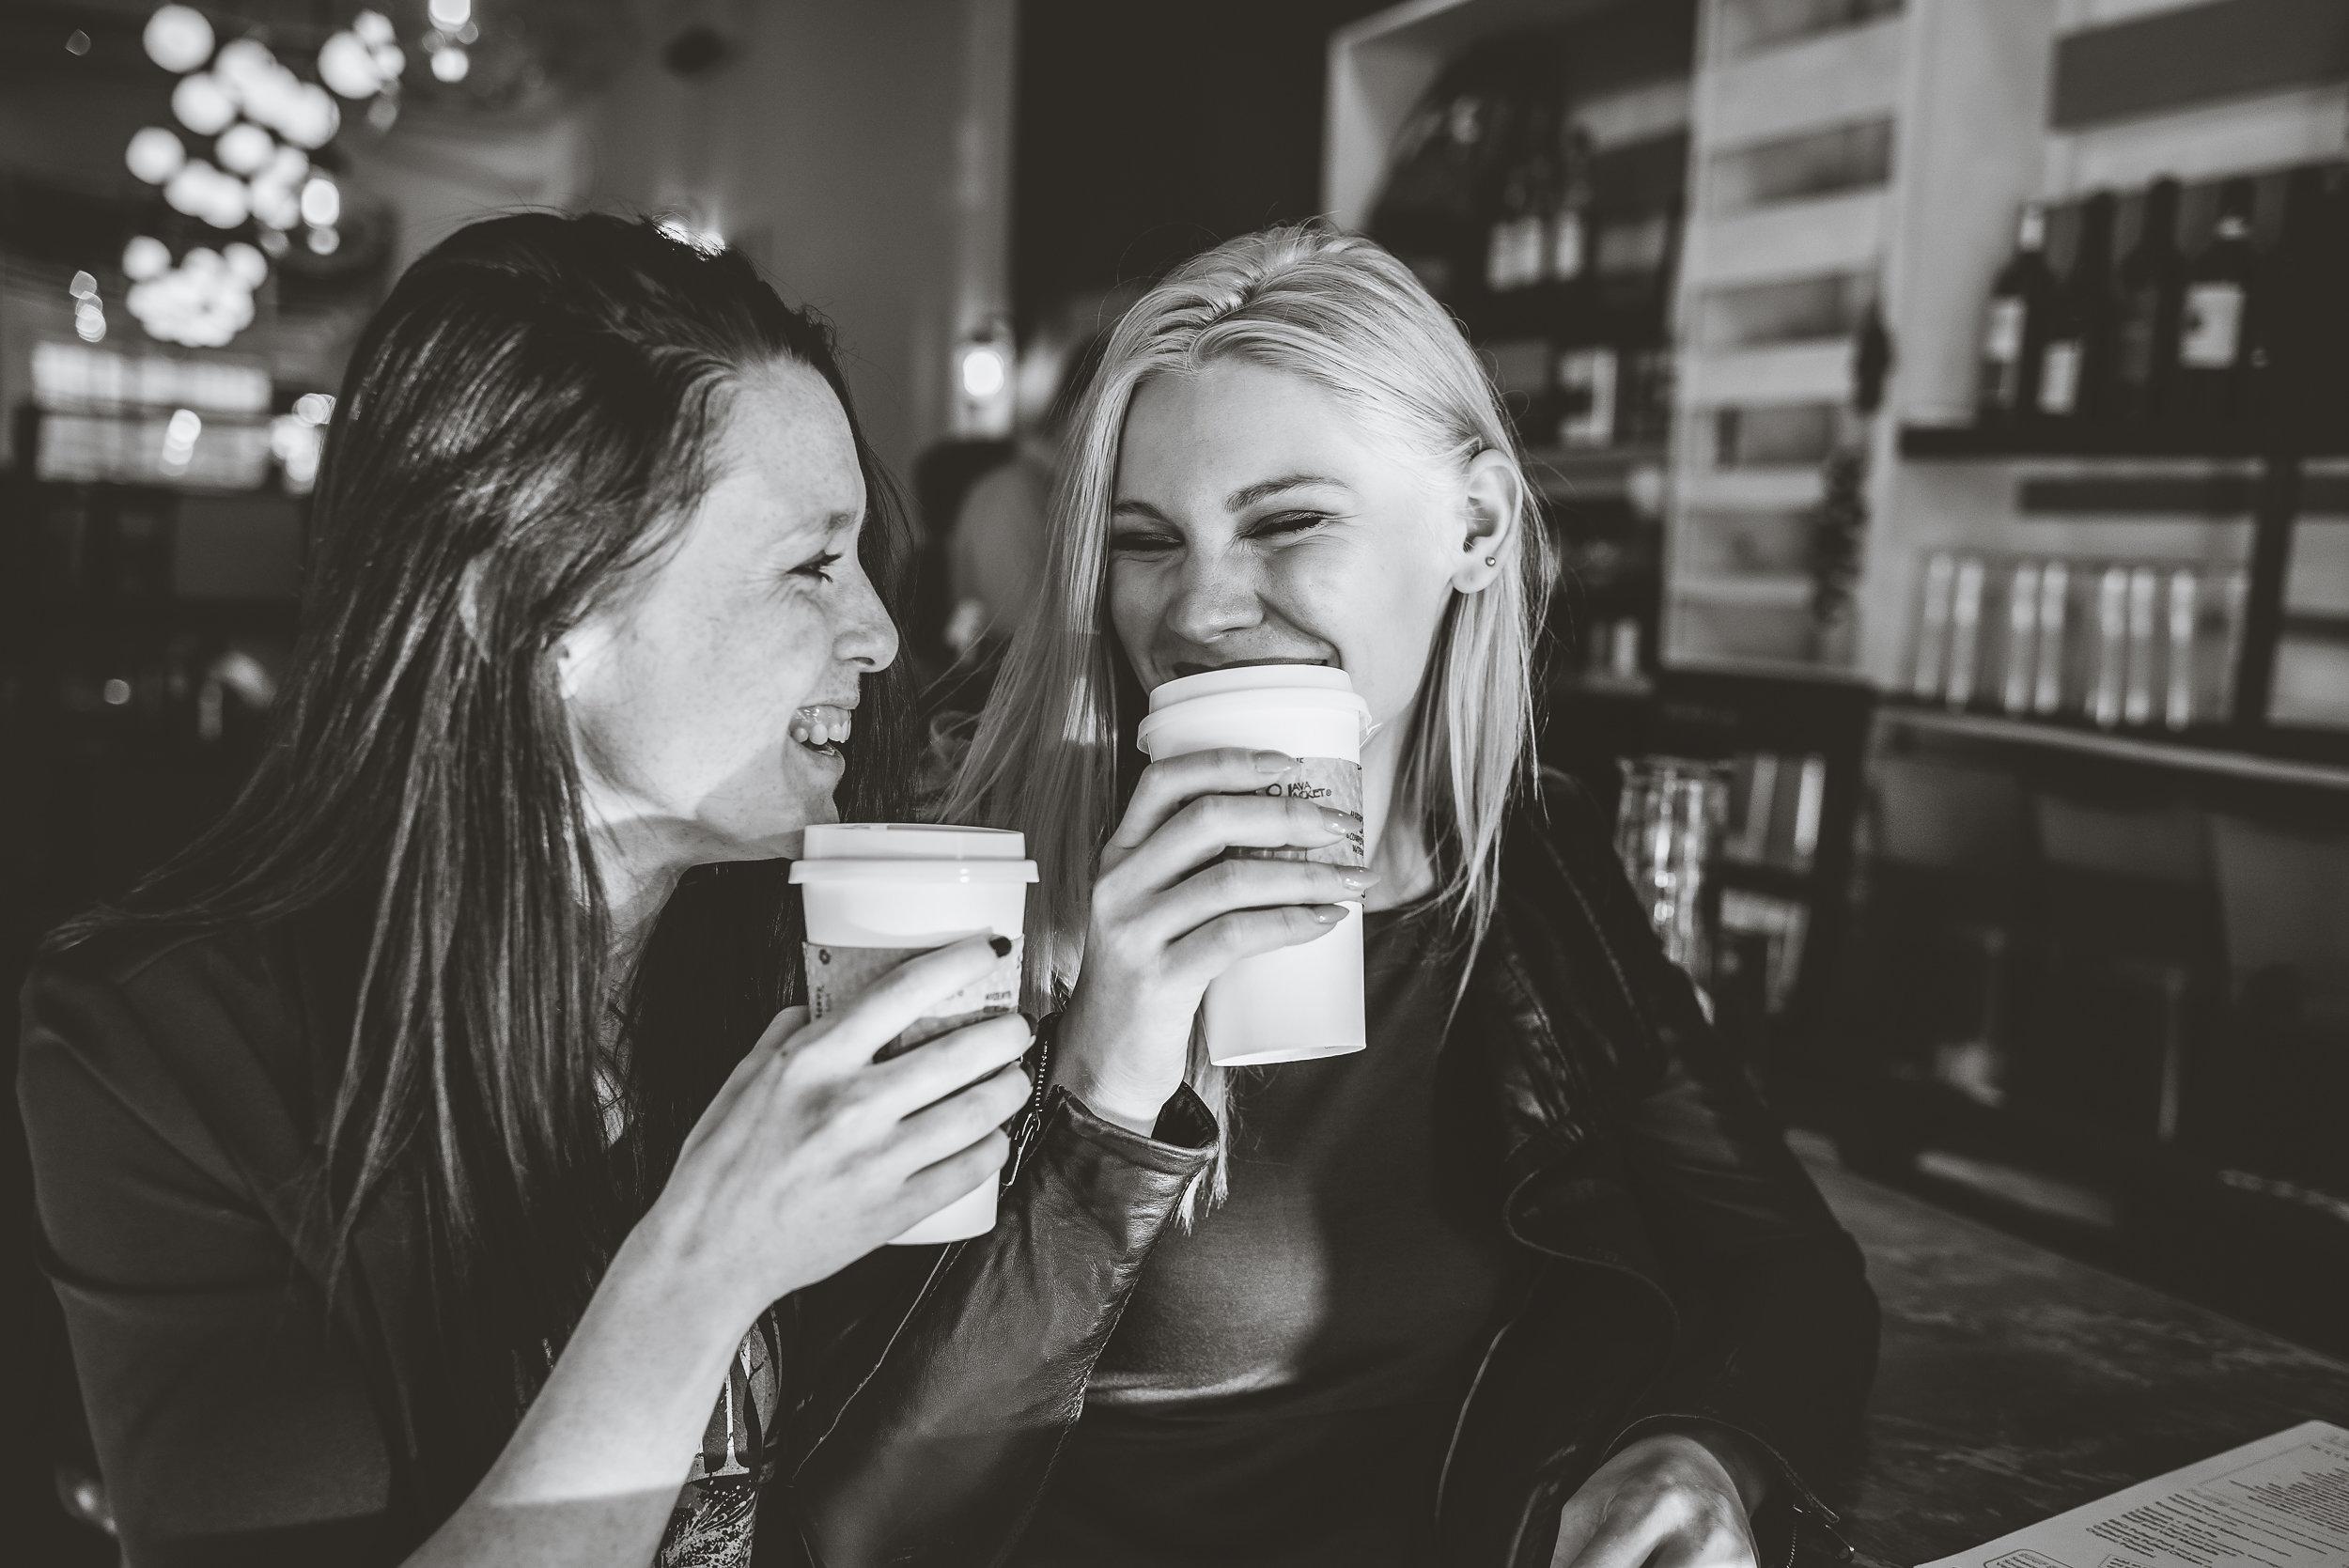 Alexa&Emily Dumbo NYC Couples Session (31).JPG